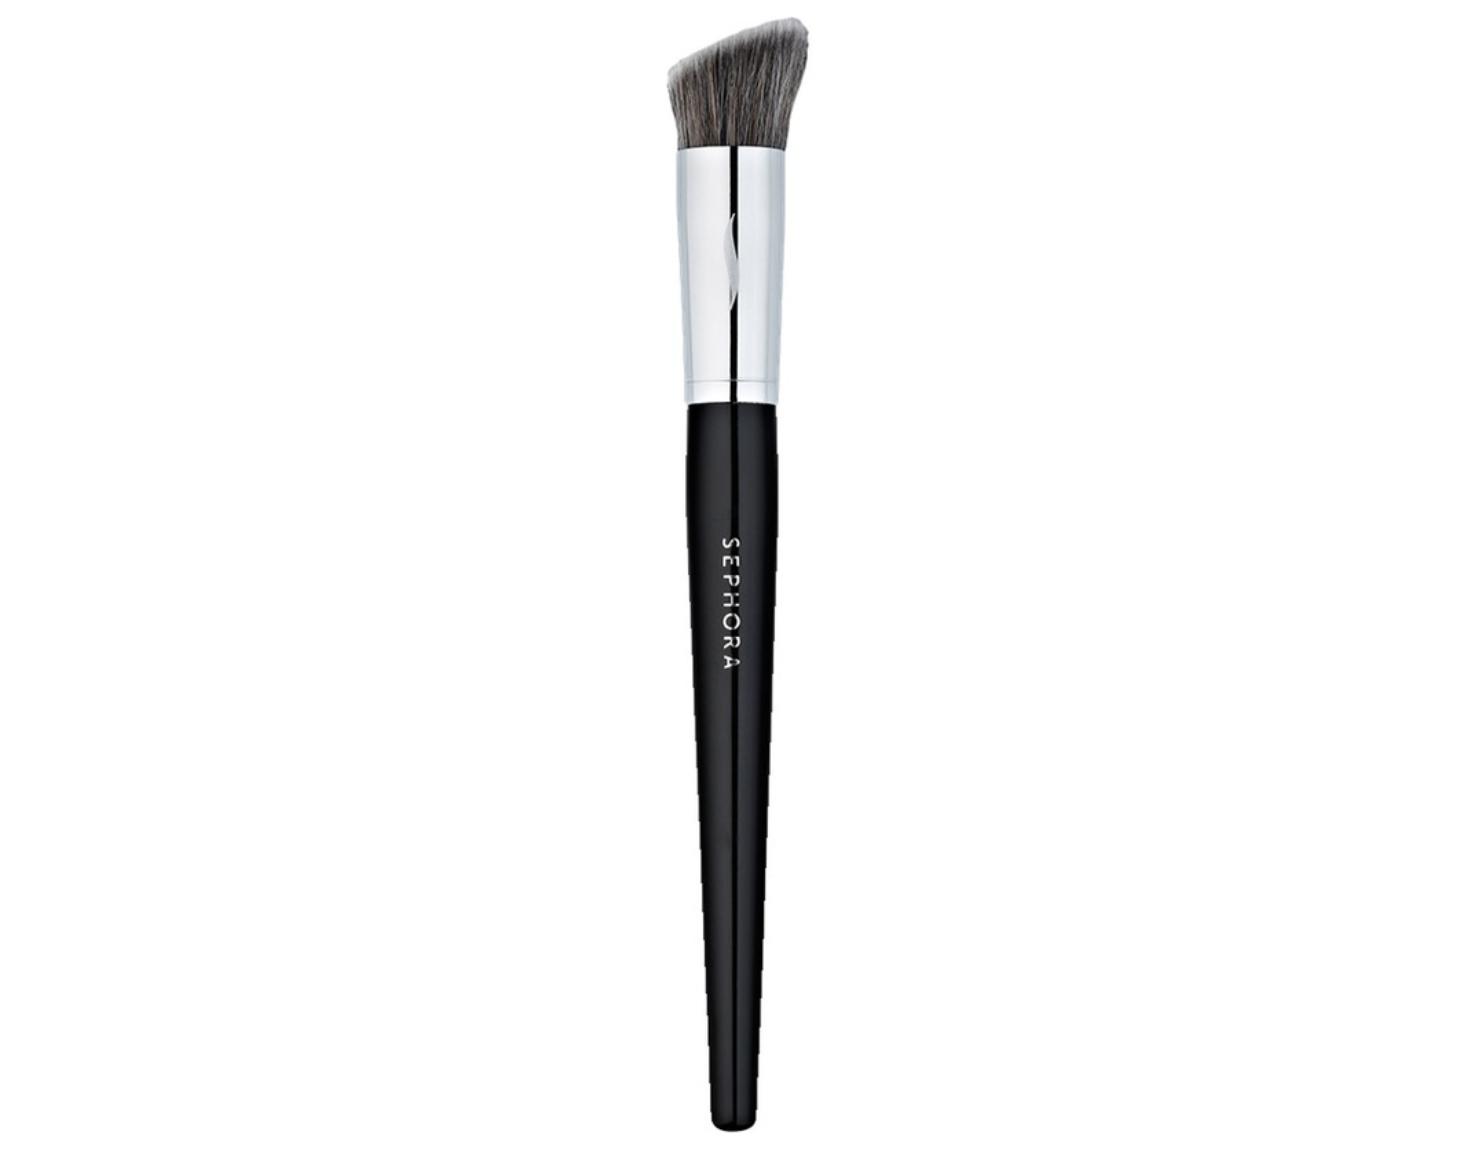 Sephora Angled Brush Diskon 50%